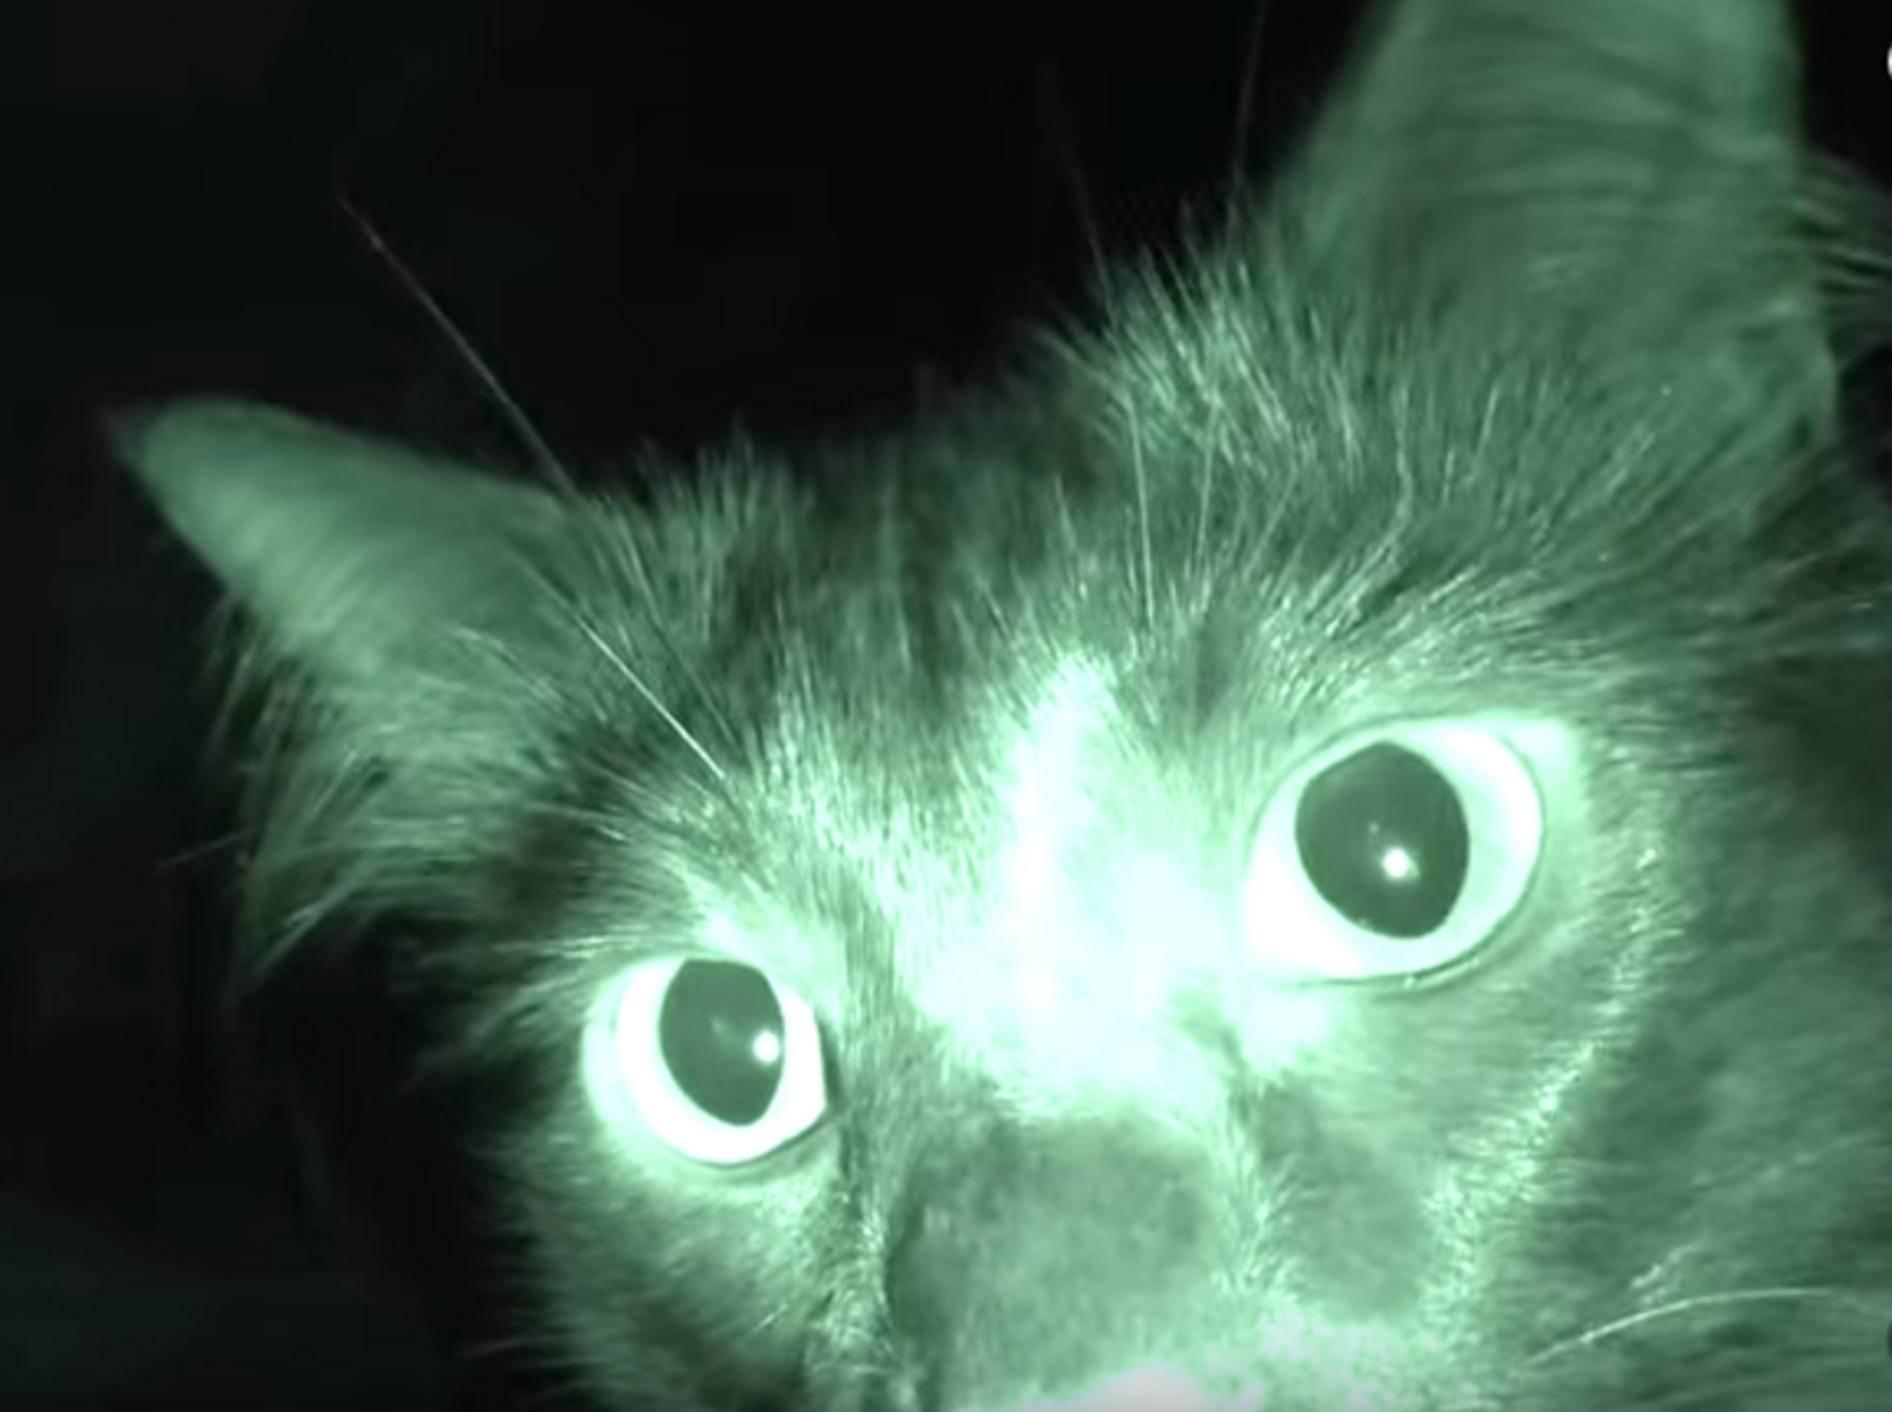 Nachts wird's gruselig: Cole und Marmalade an Halloween – Bild: YouTube / Cole and Marmalade